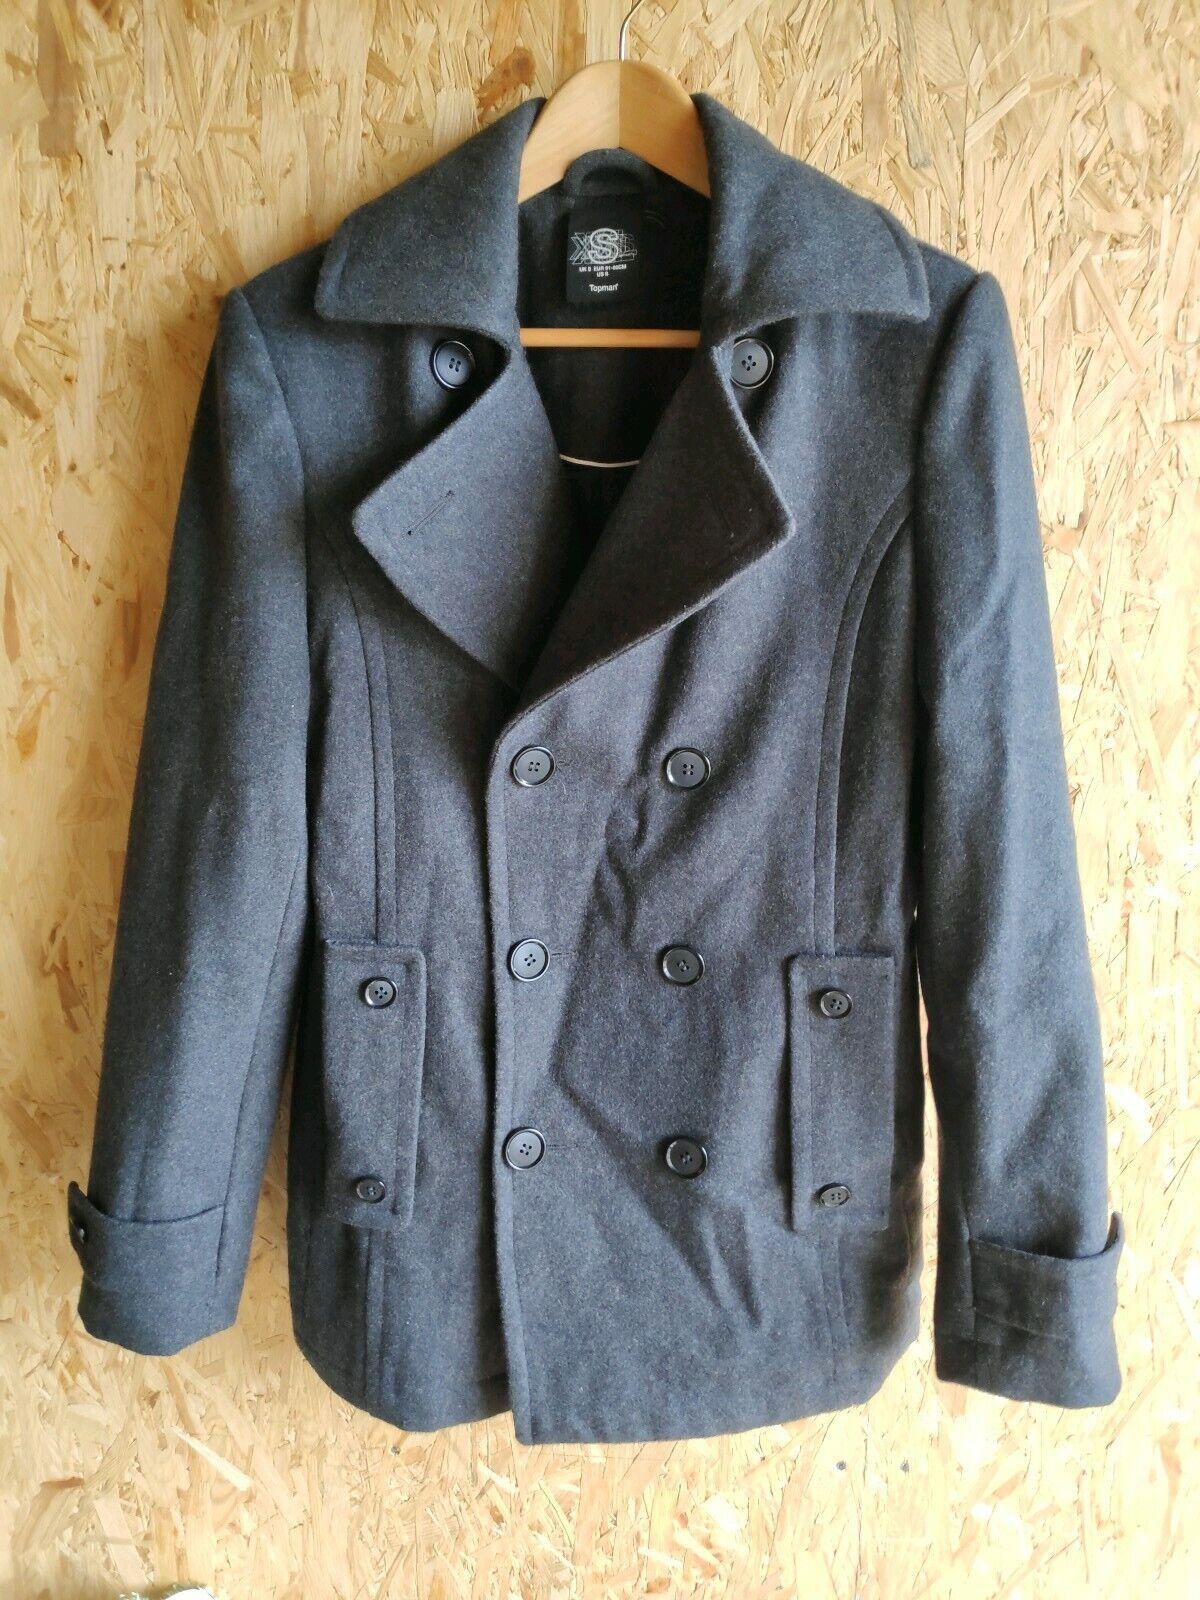 Topman Mens Wool Duffle Coat - S - Grey